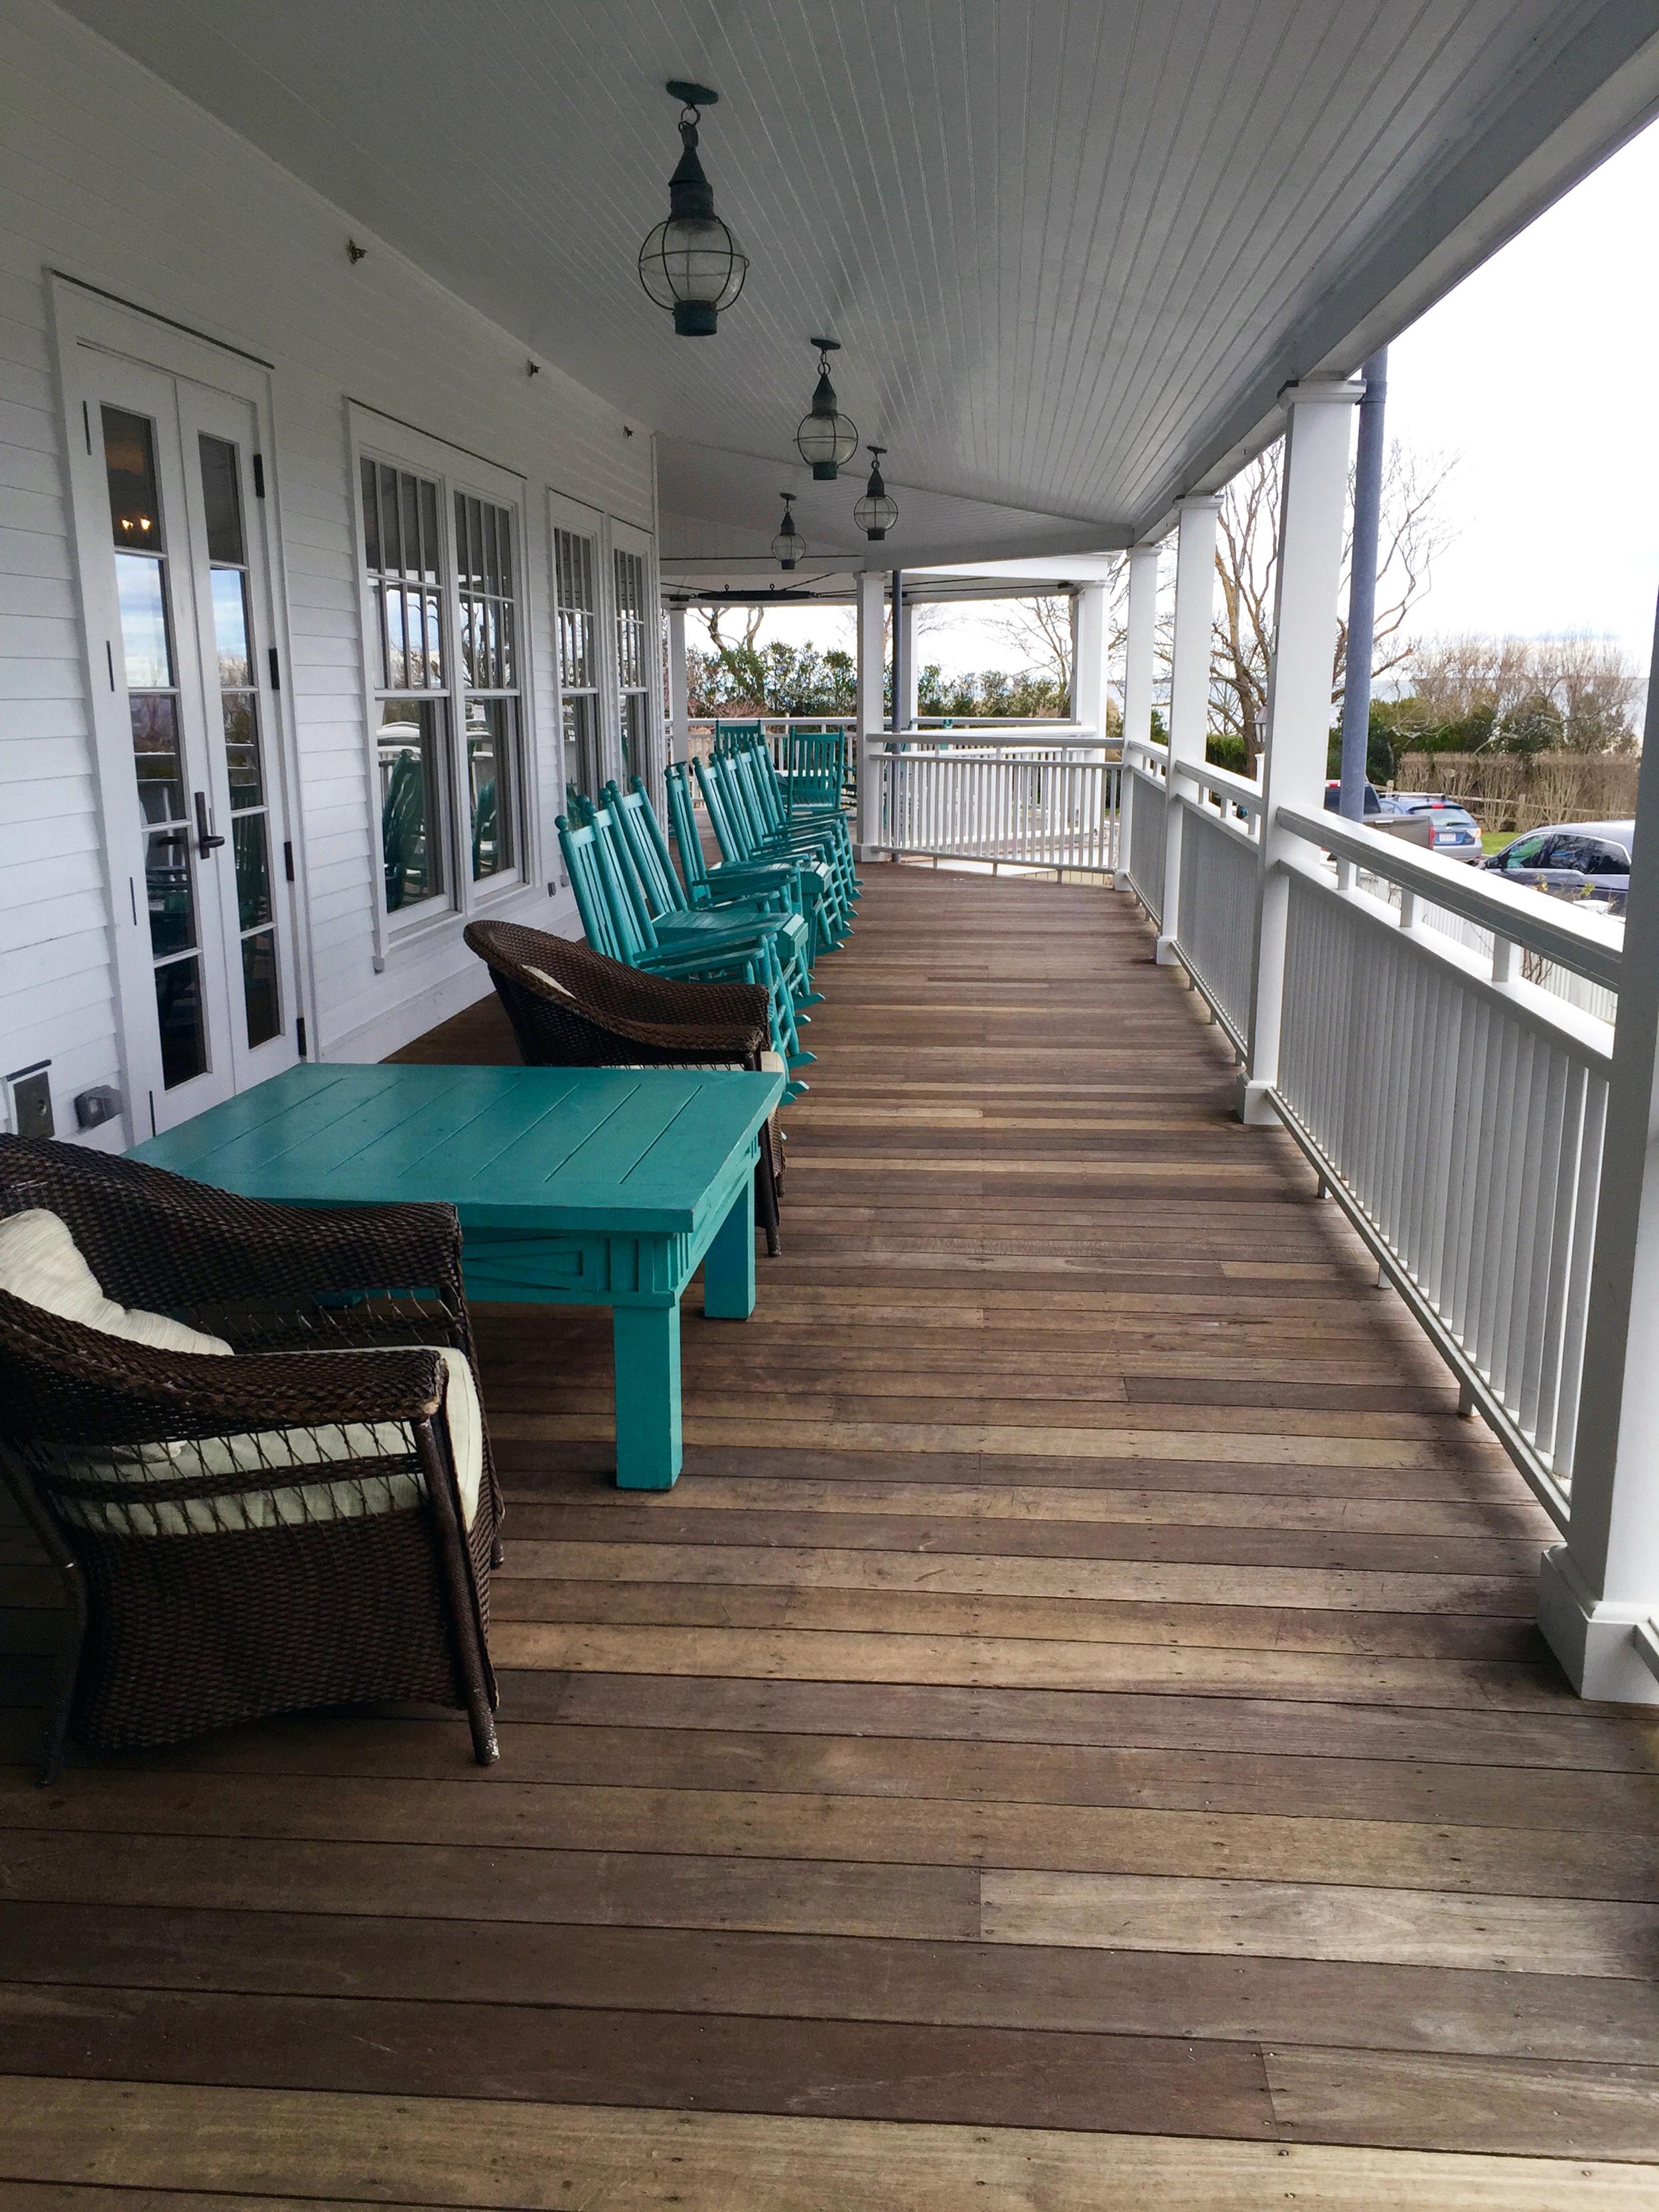 Harbor View Hotel porch